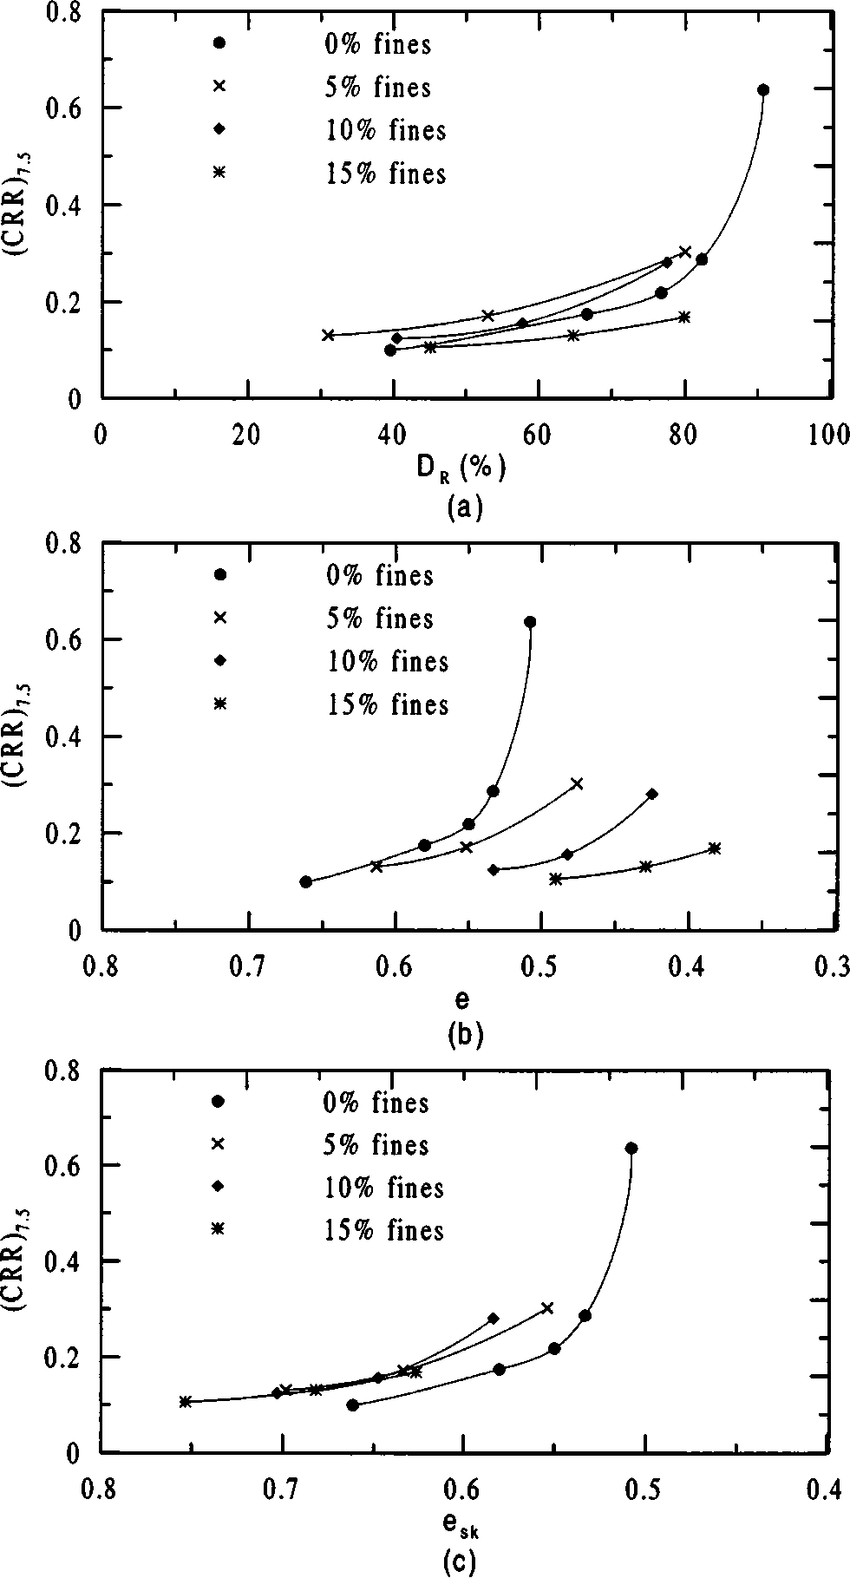 hight resolution of cyclic resistance ratio crr 7 5 versus a relative density d r b download scientific diagram